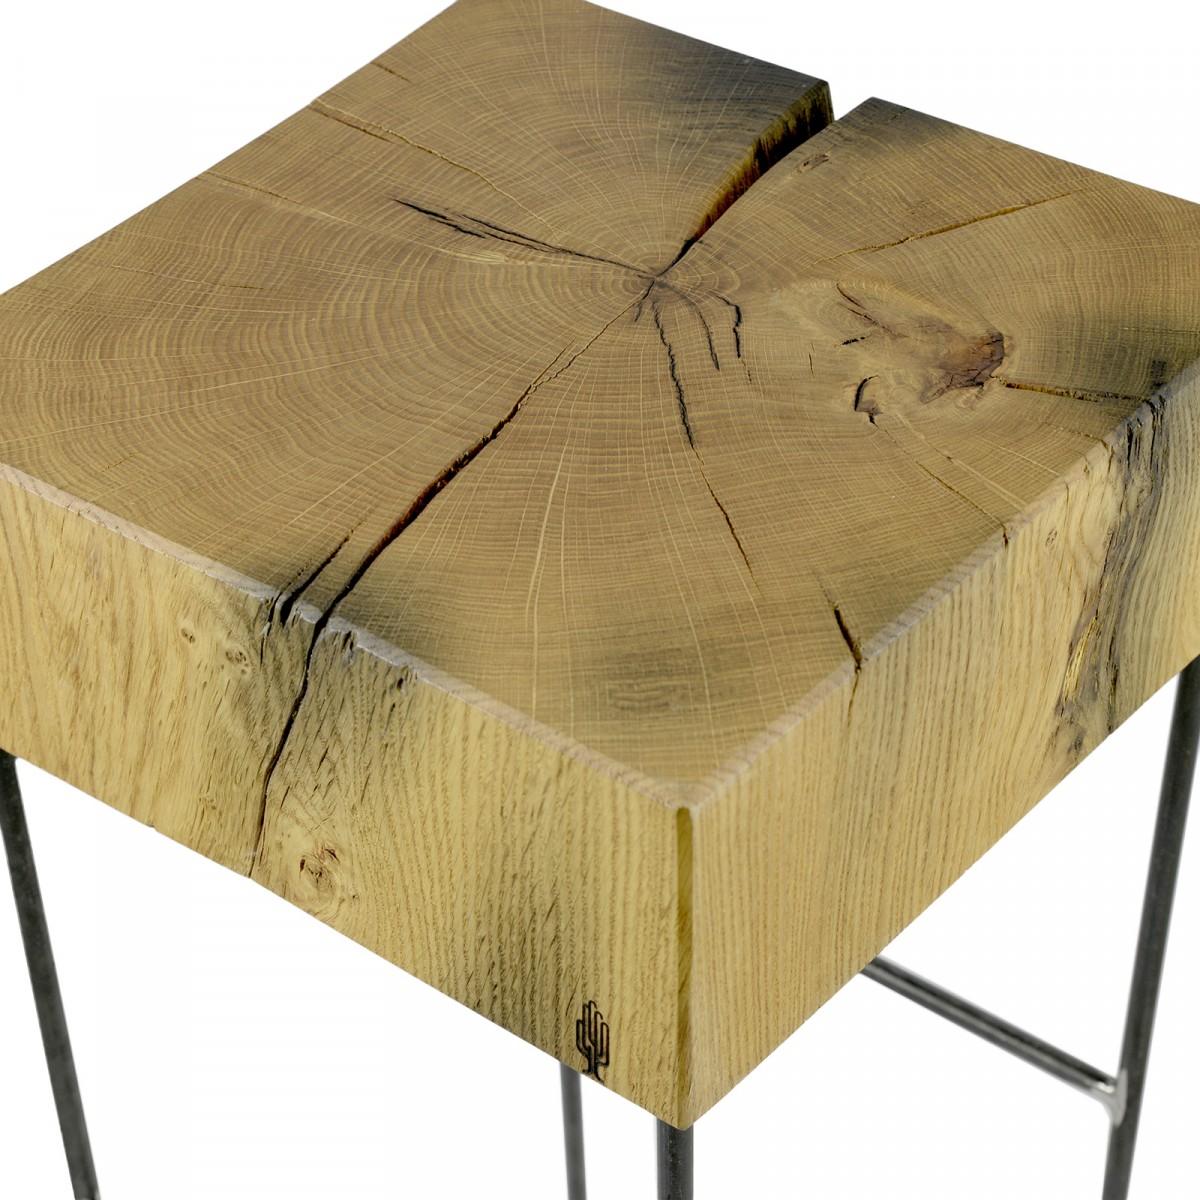 Hocker tabureto granda | Holzbutiq